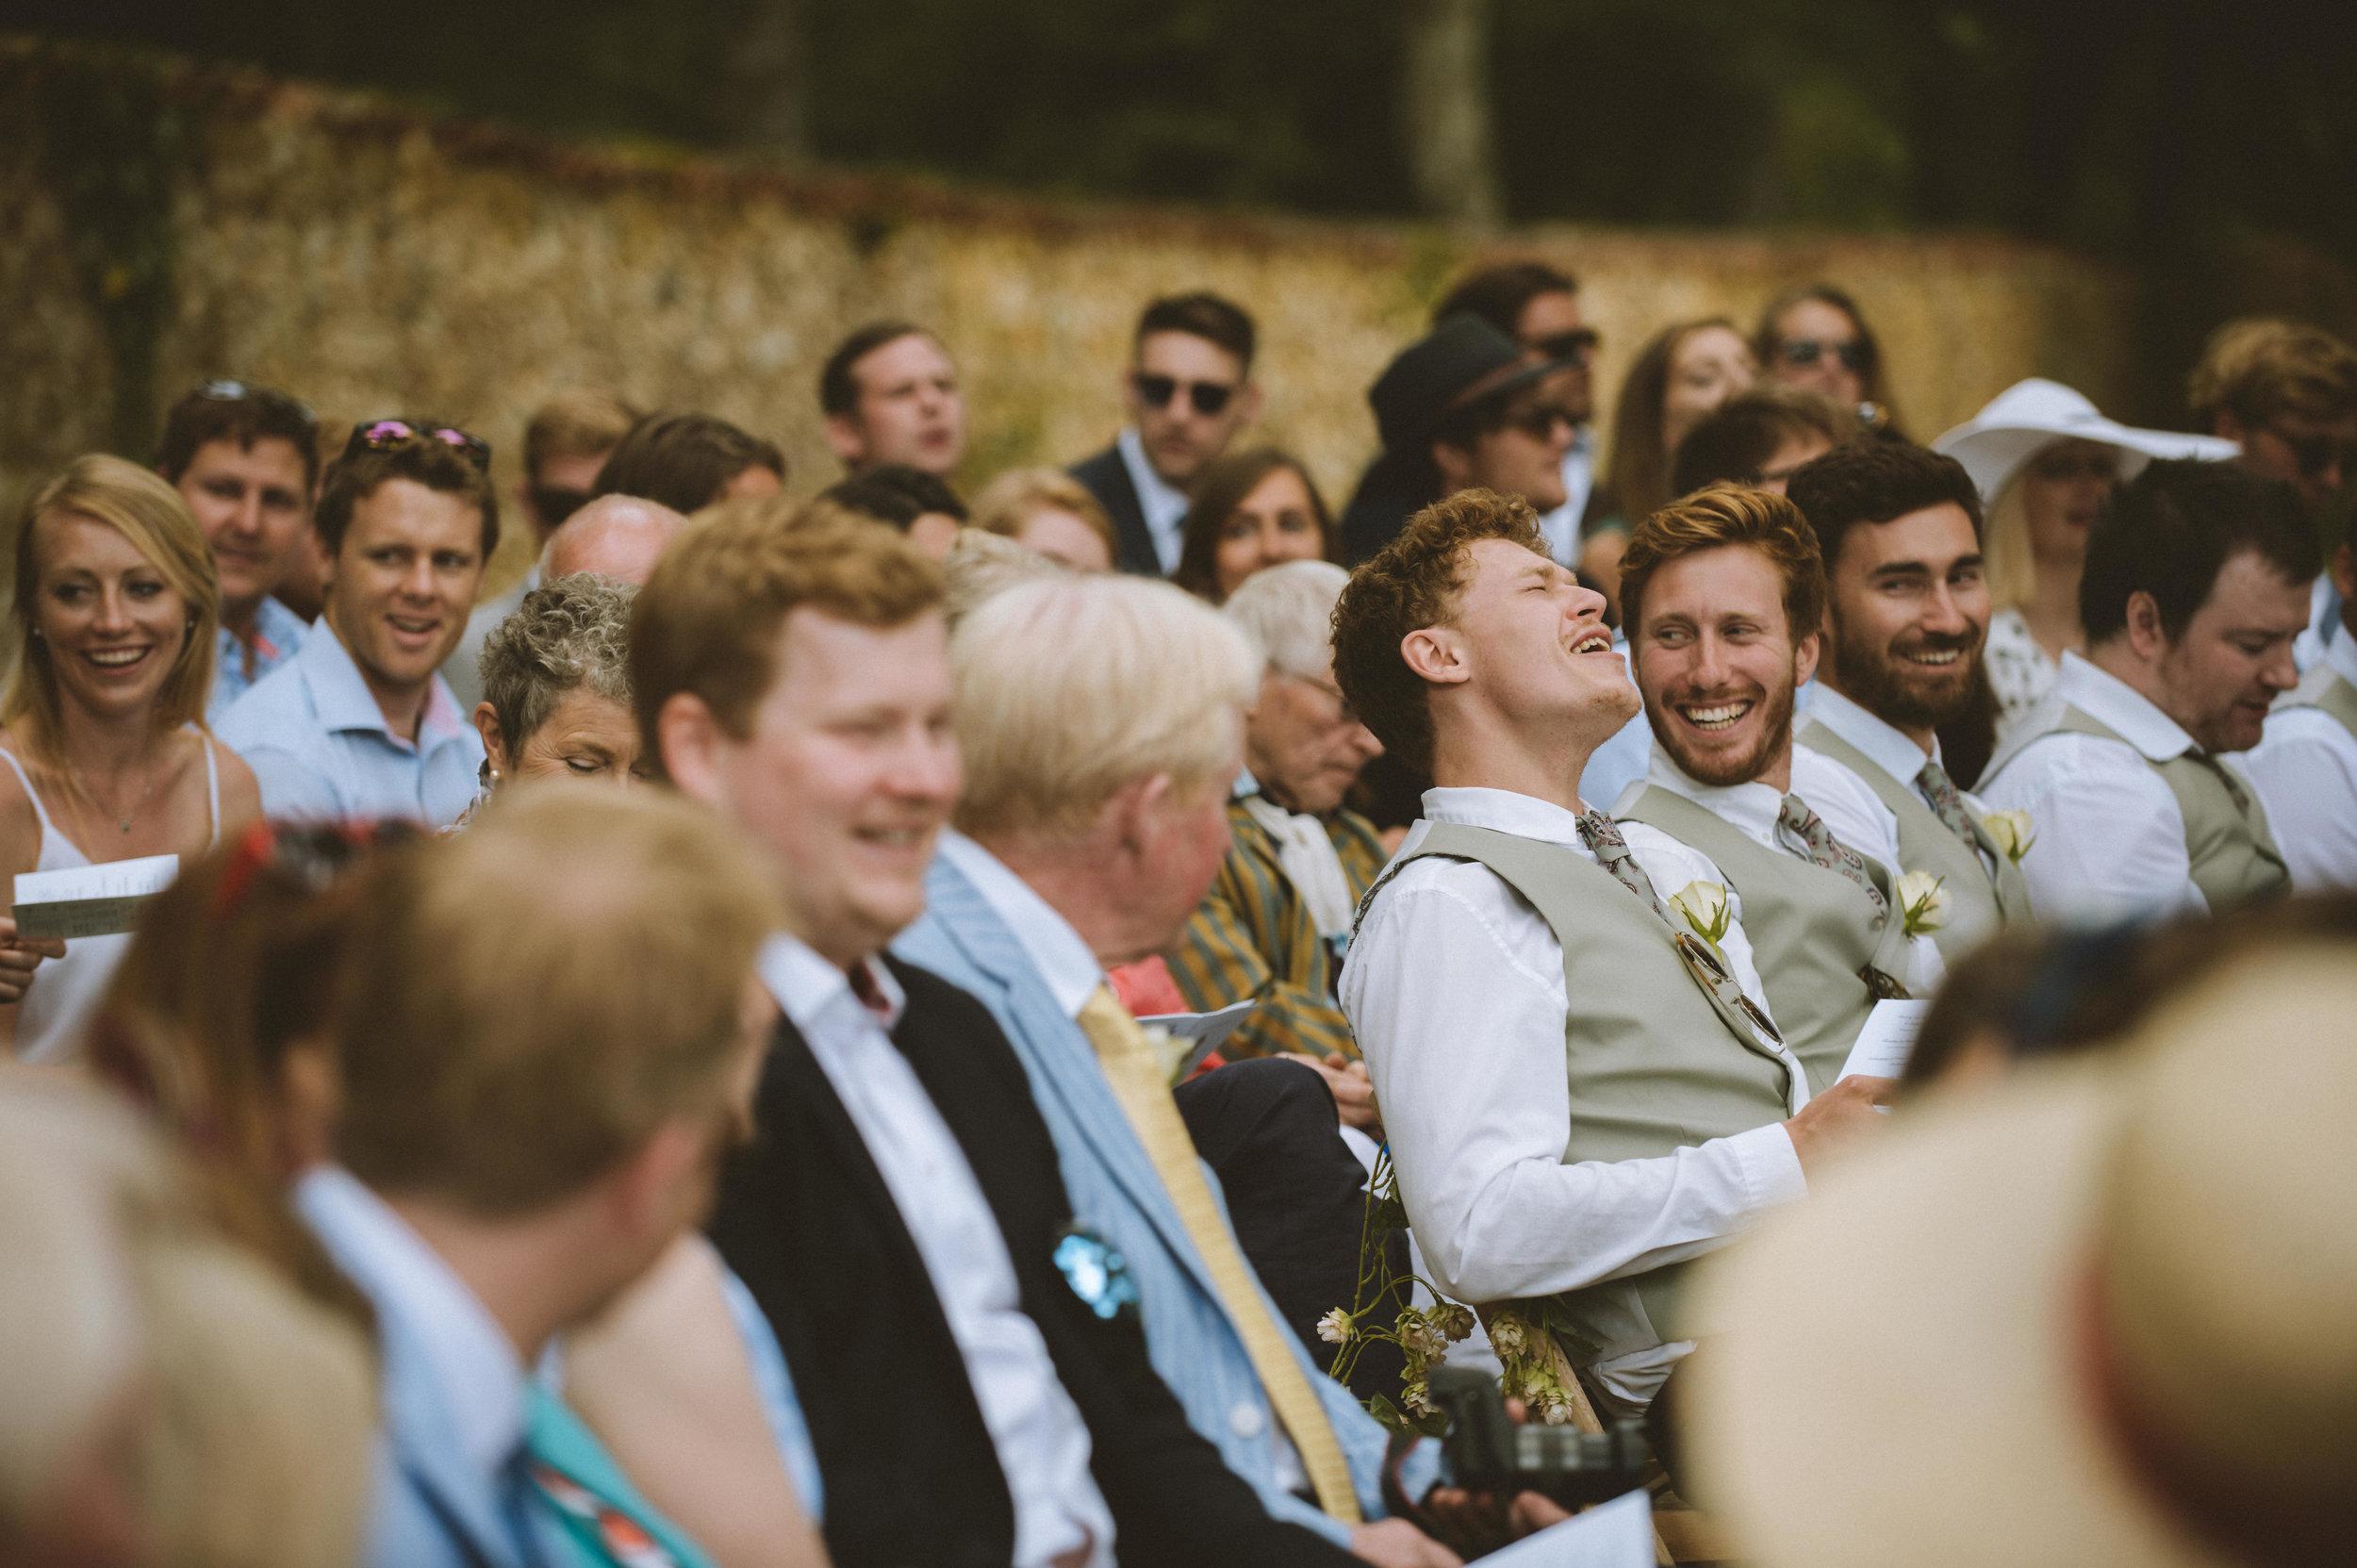 dordogne-wedding-photographer-mark-shaw-36.jpg